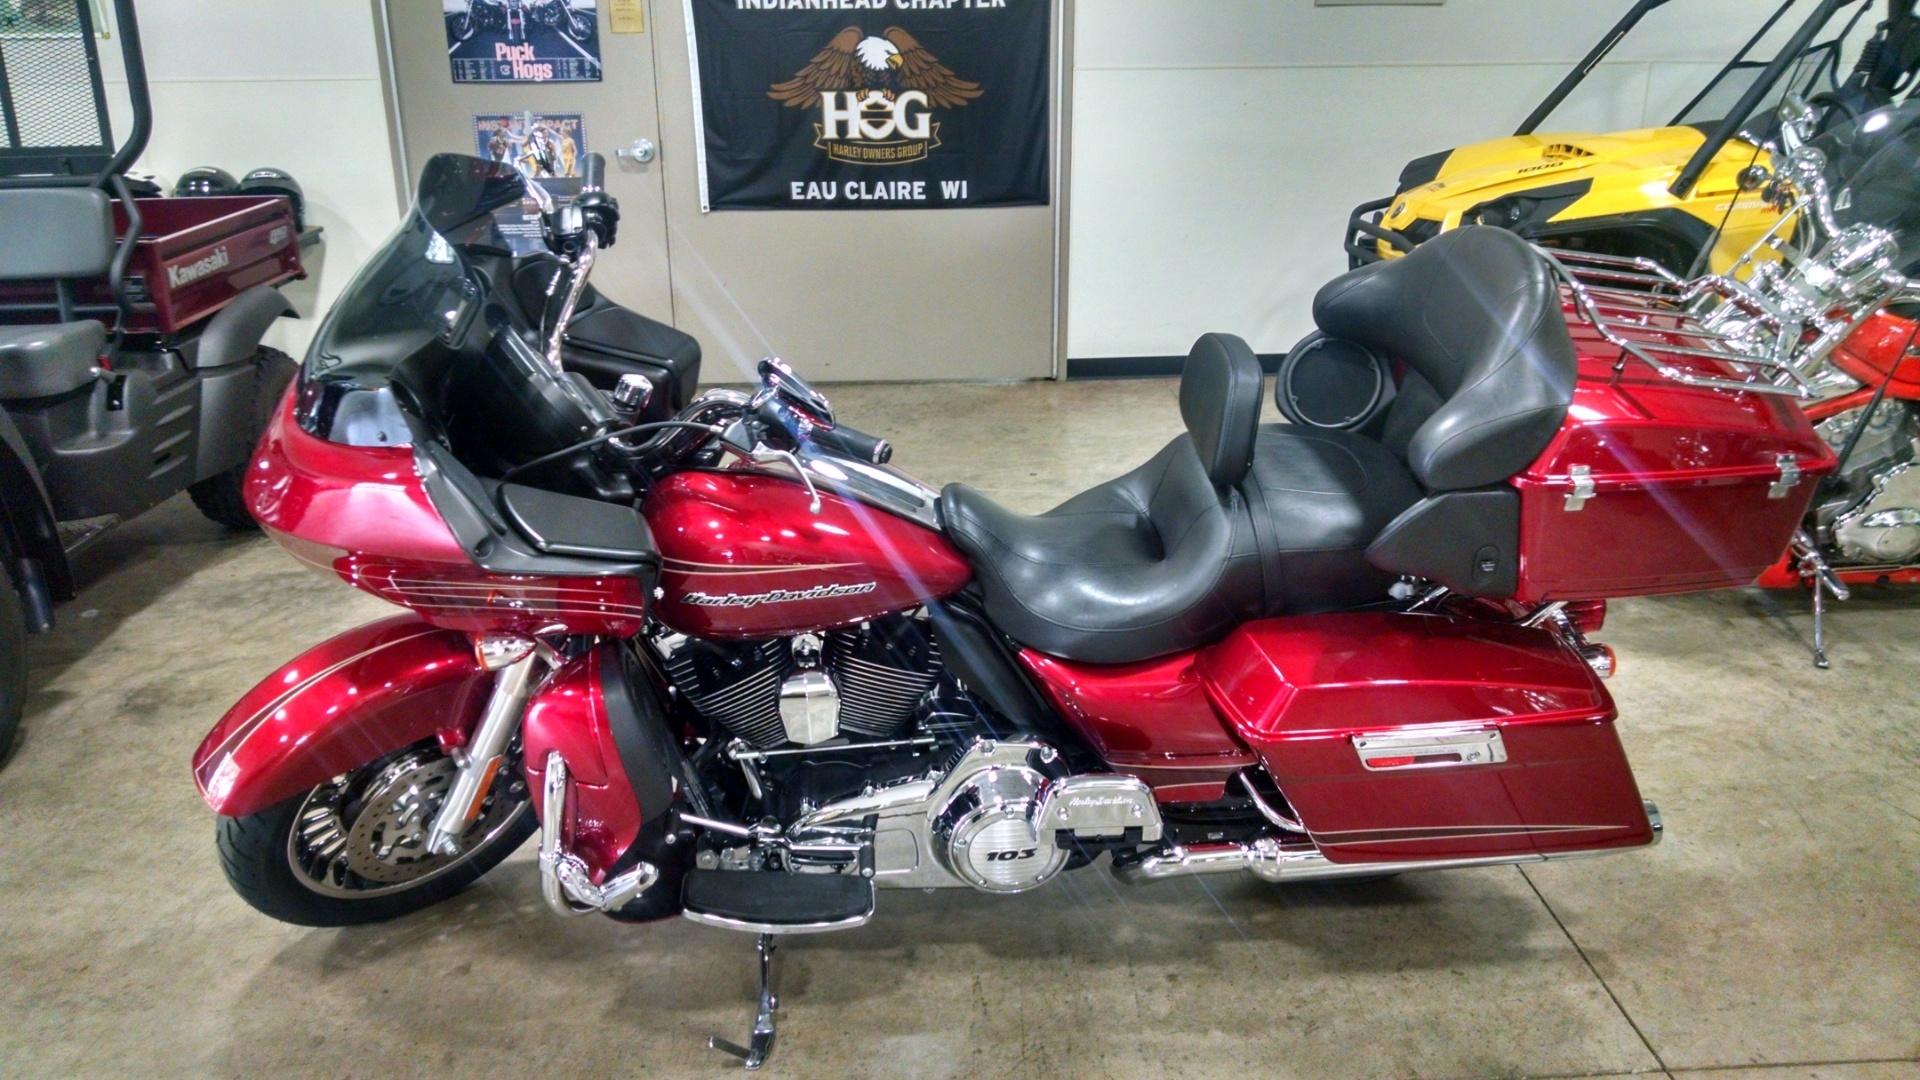 2012 Harley-Davidson Road Glide® Ultra in Chippewa Falls, Wisconsin